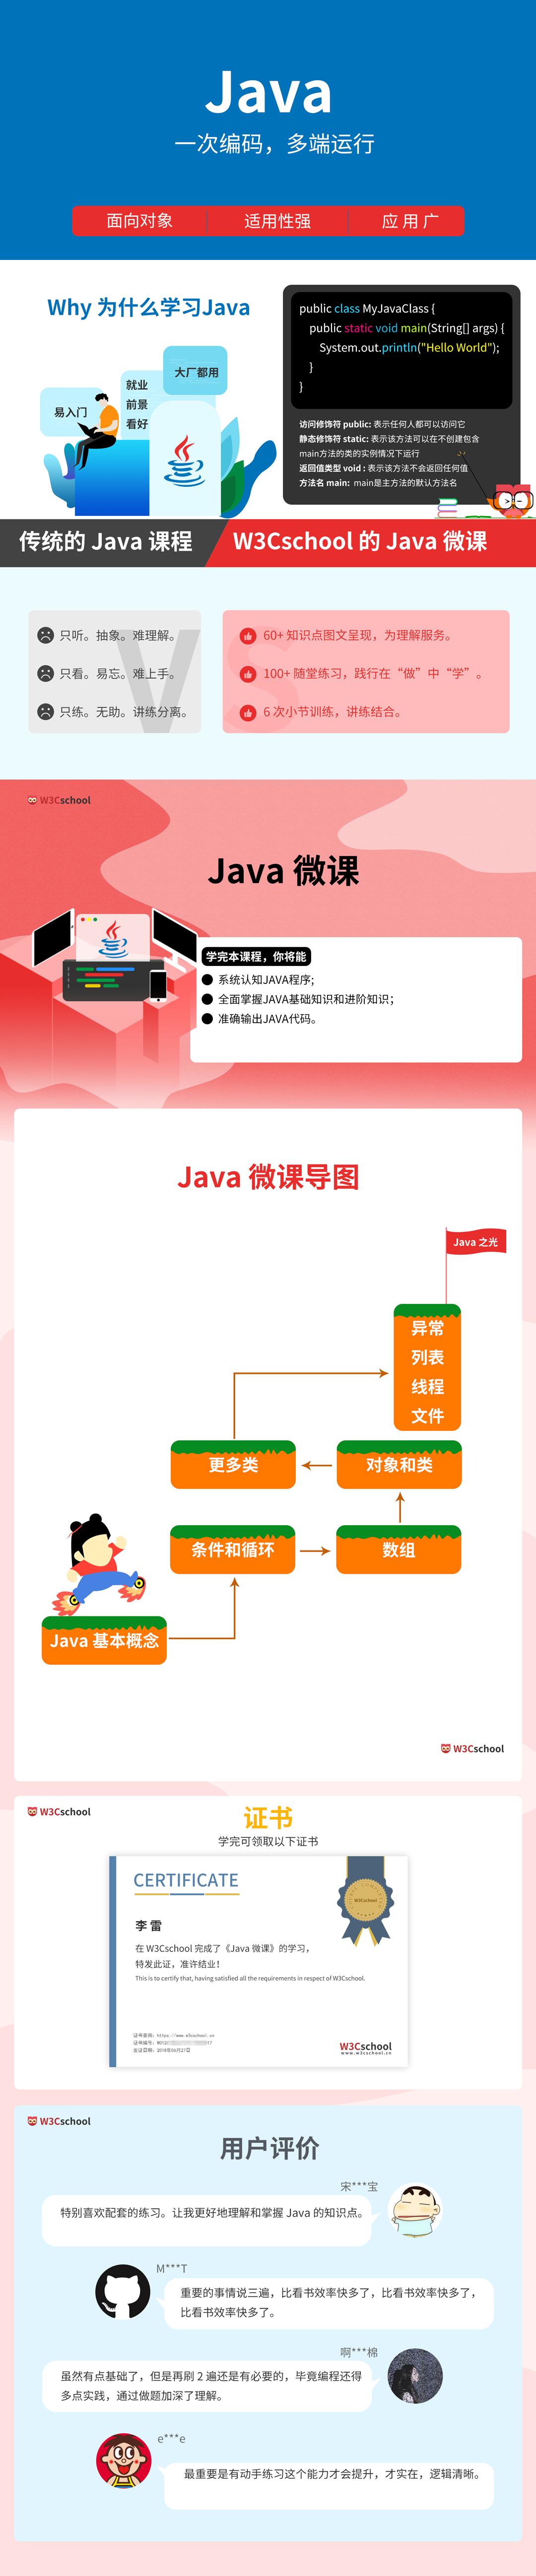 Java微課課程介紹